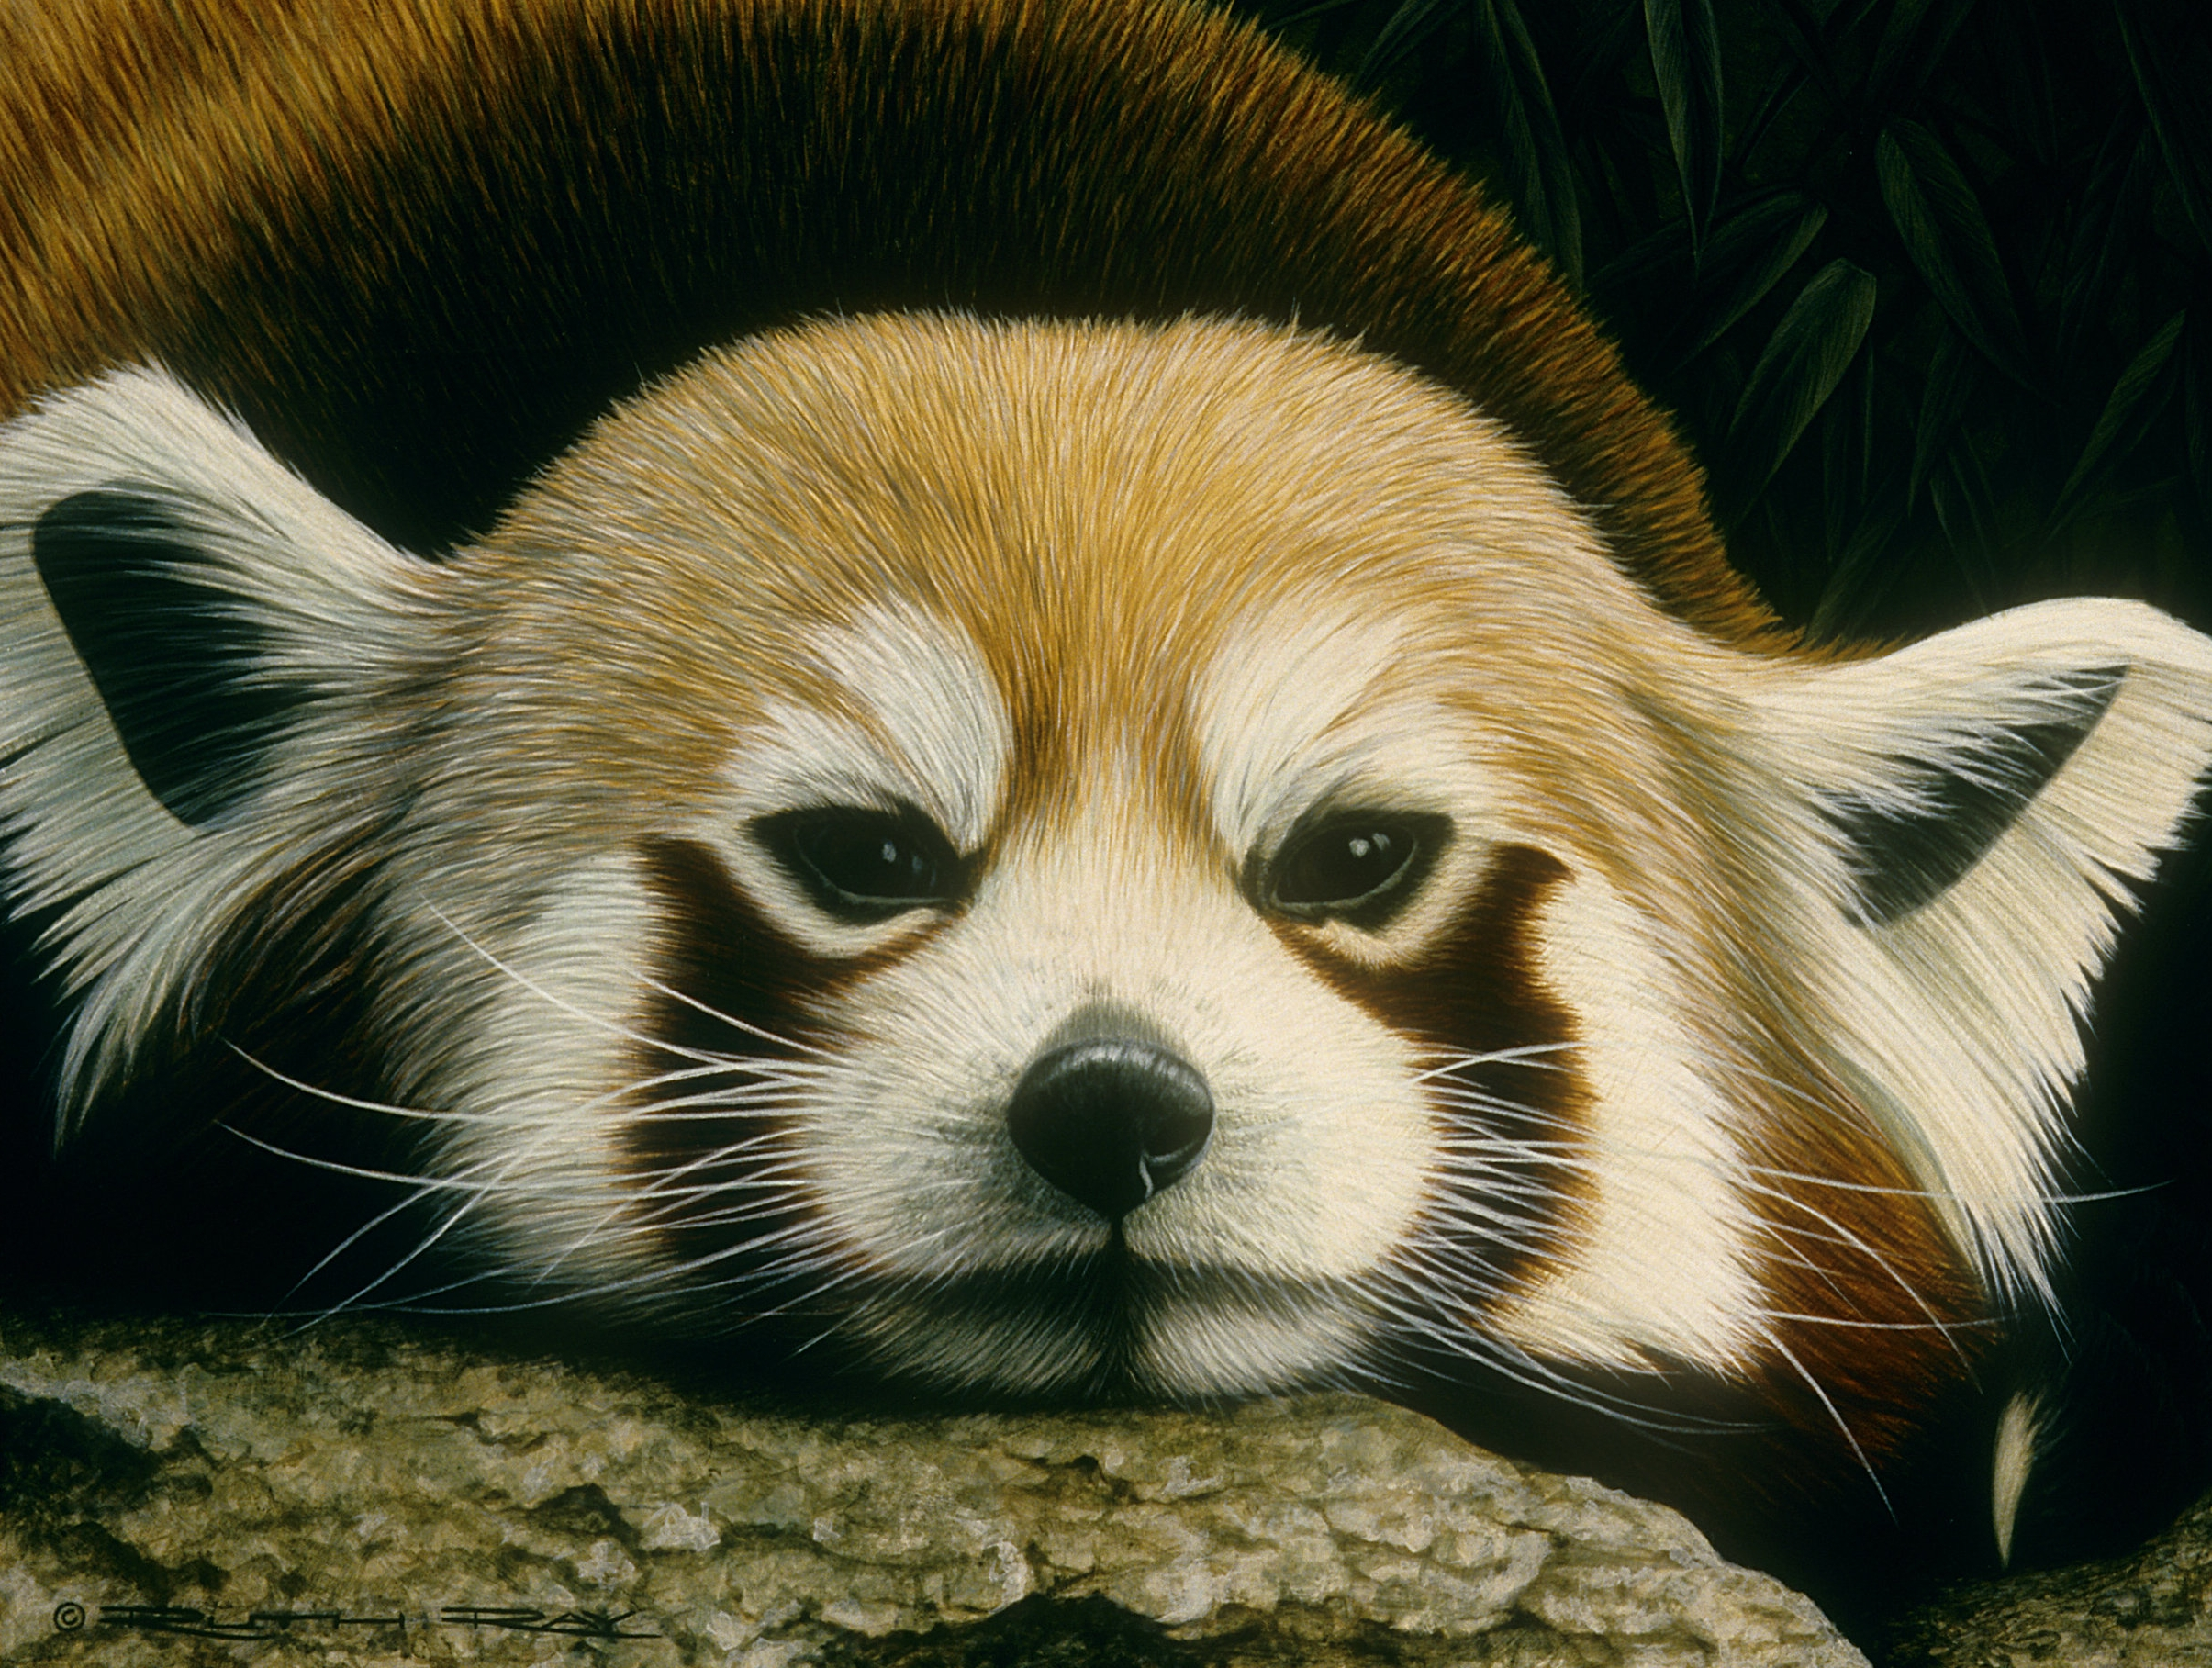 The Good Place_Red Panda.jpg